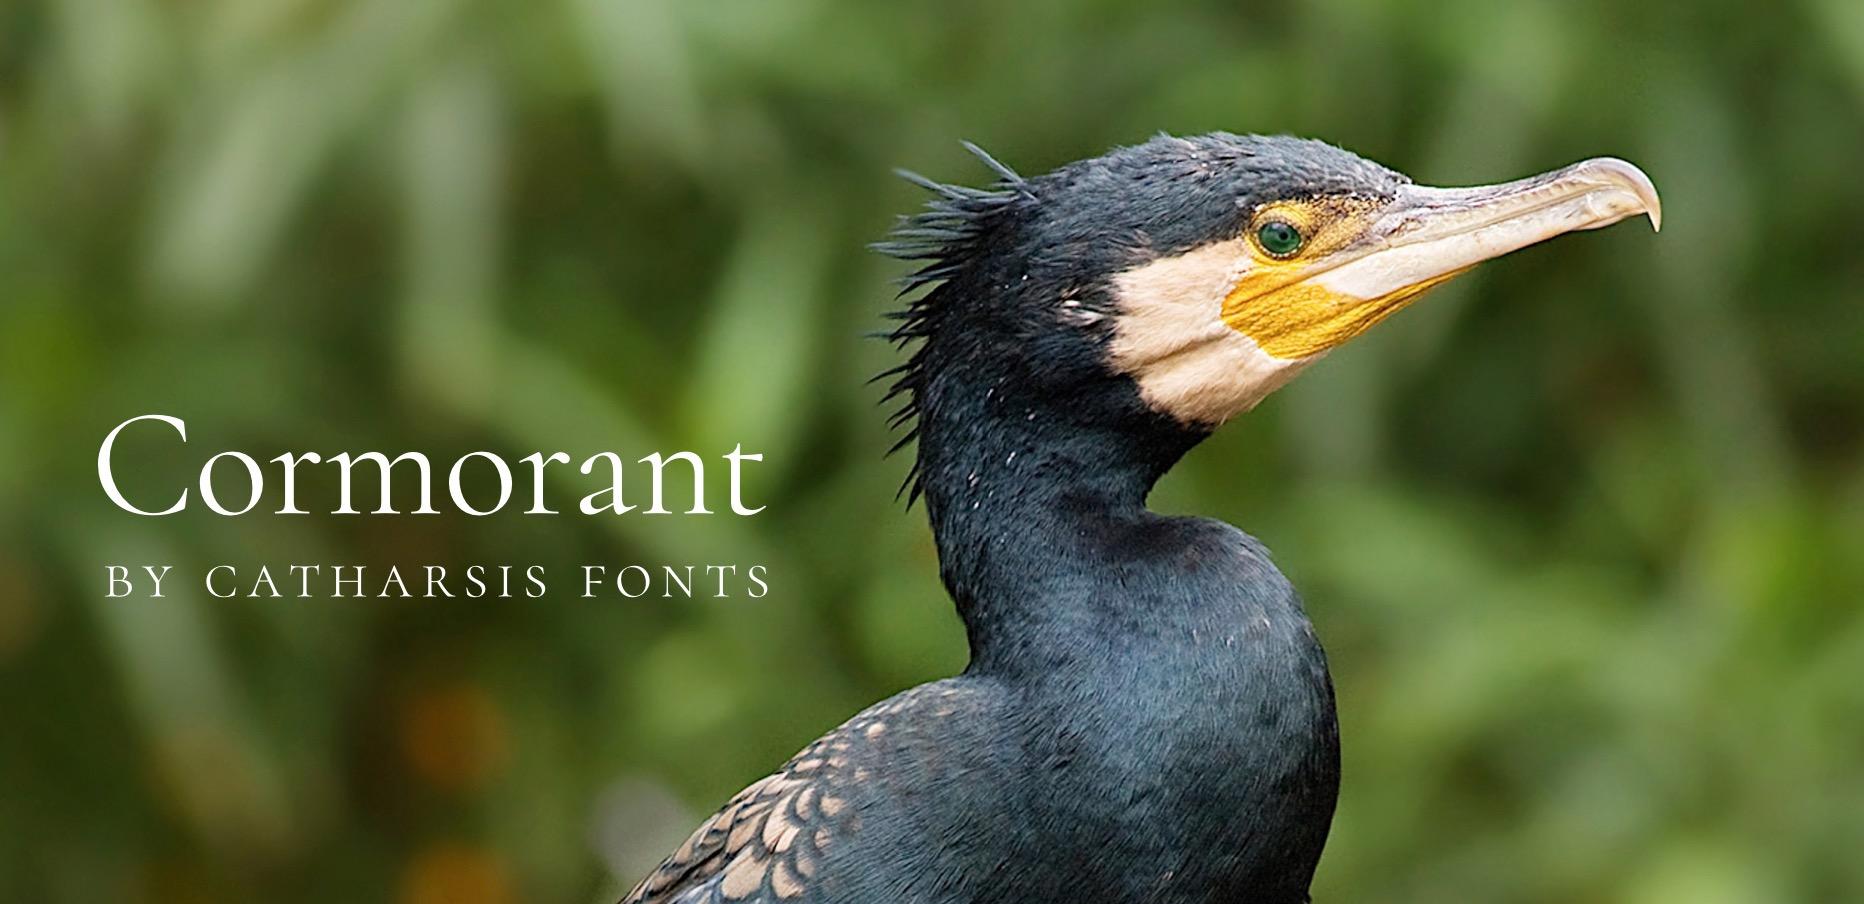 cormorant font banner